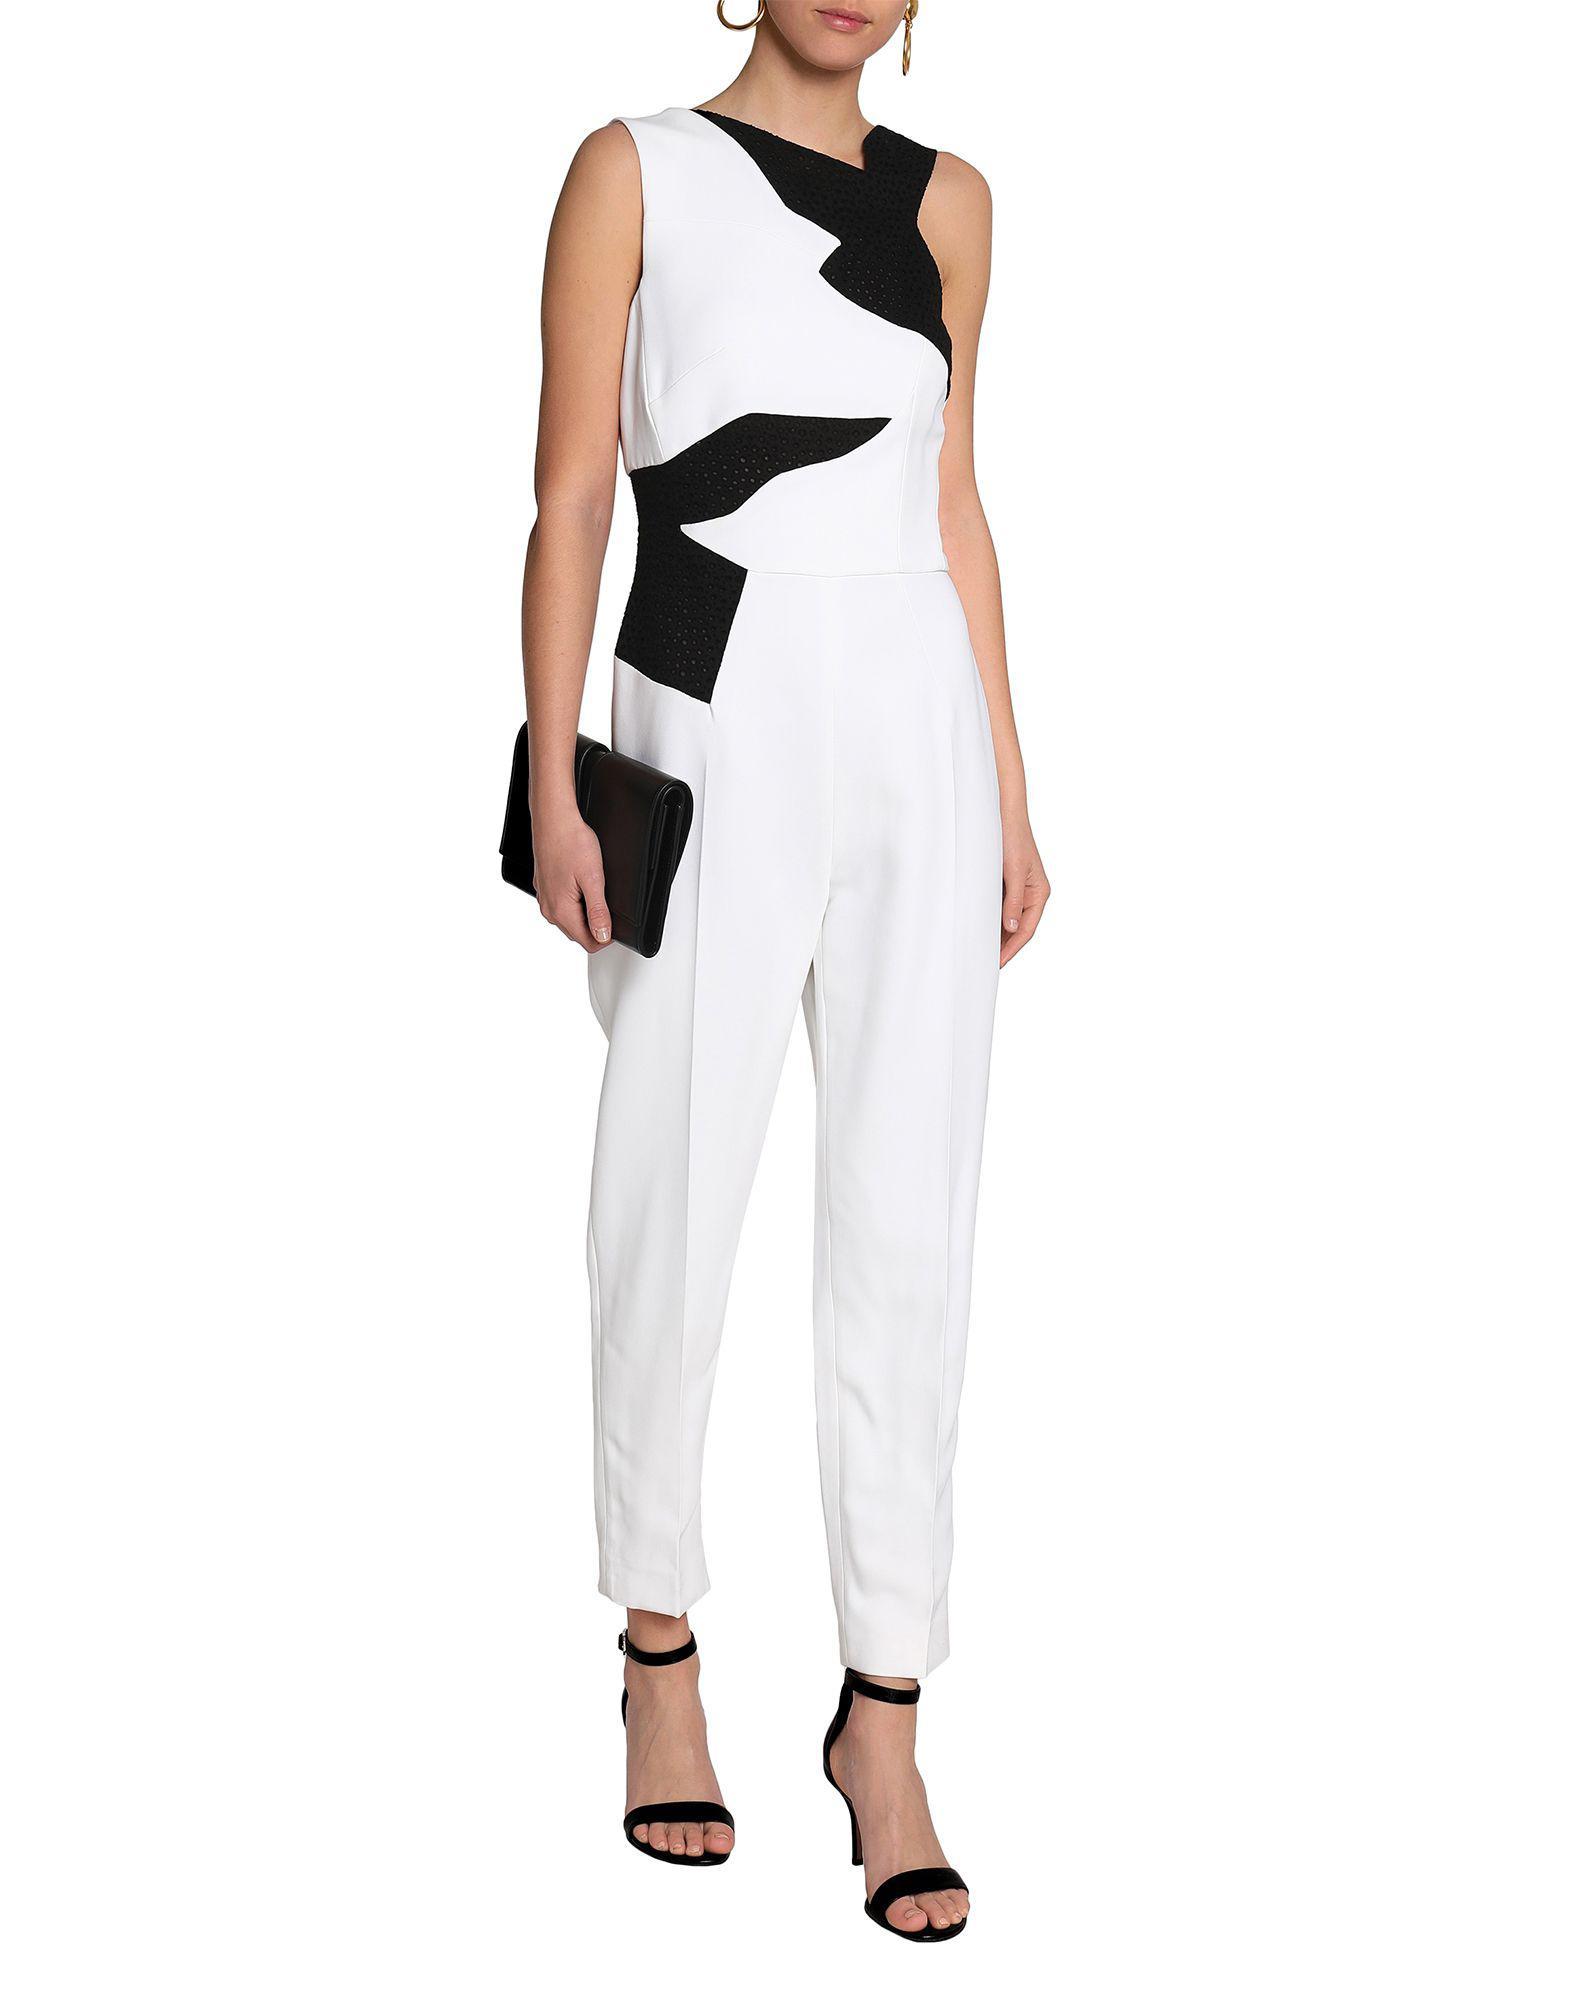 59e05a9b2c48 Antonio Berardi - White Jumpsuit - Lyst. View fullscreen